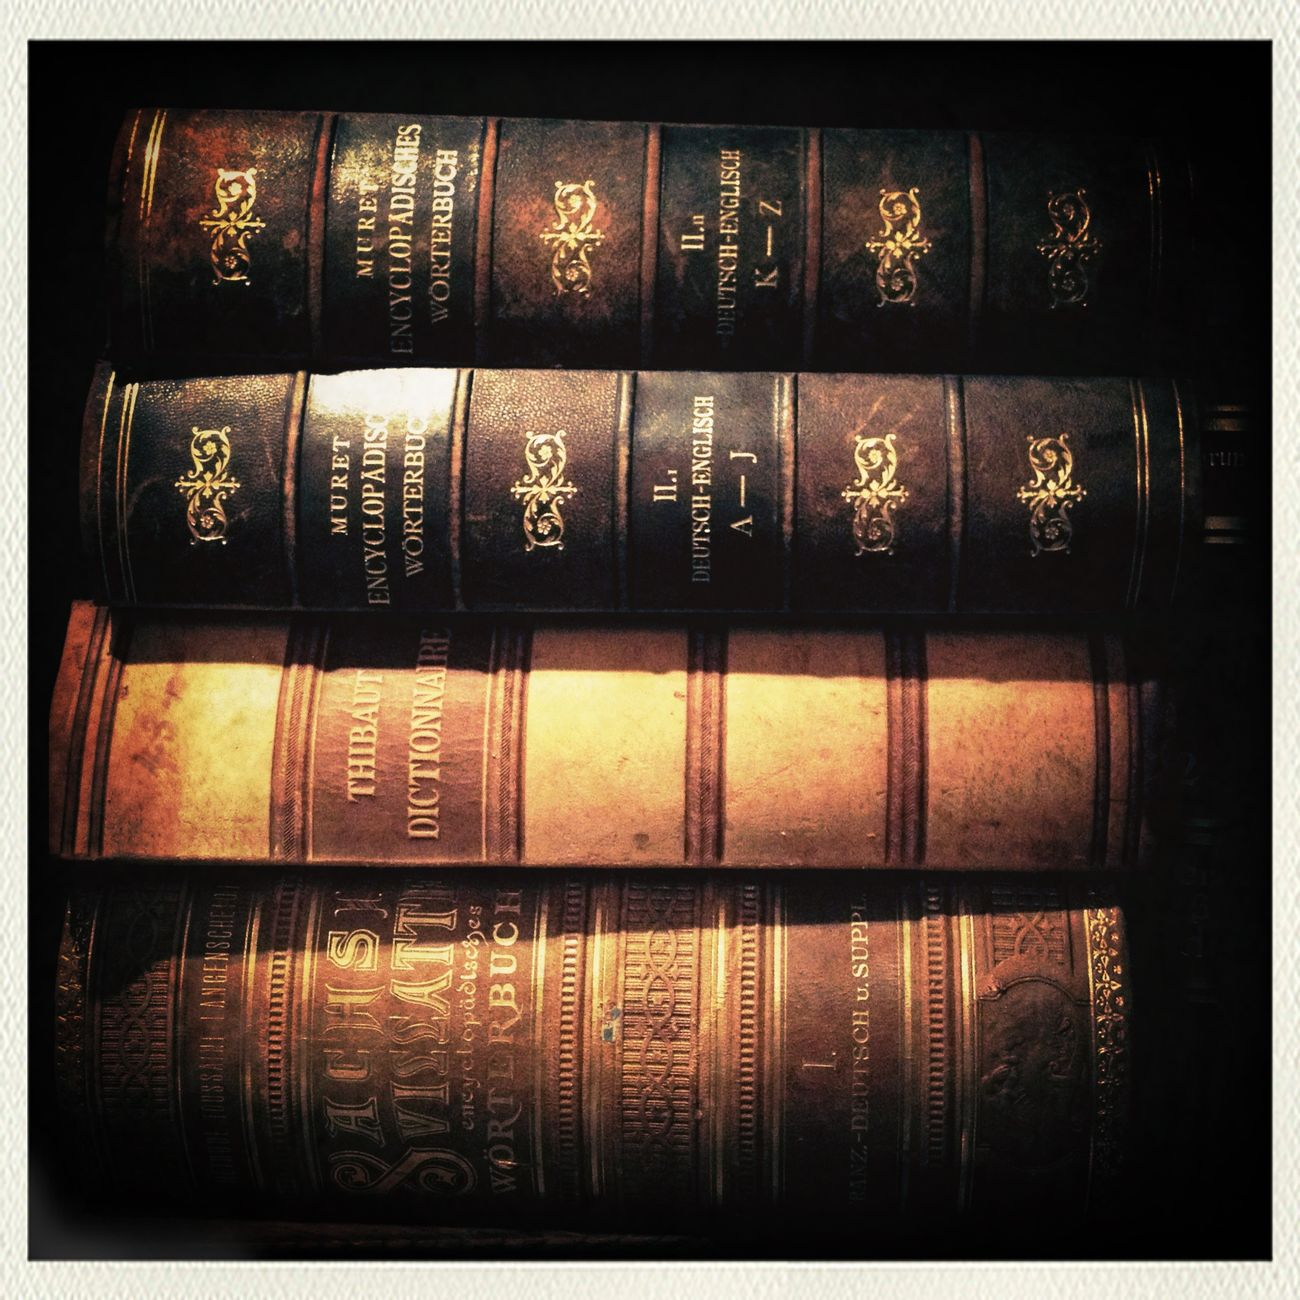 Books in Bergneustadt Books